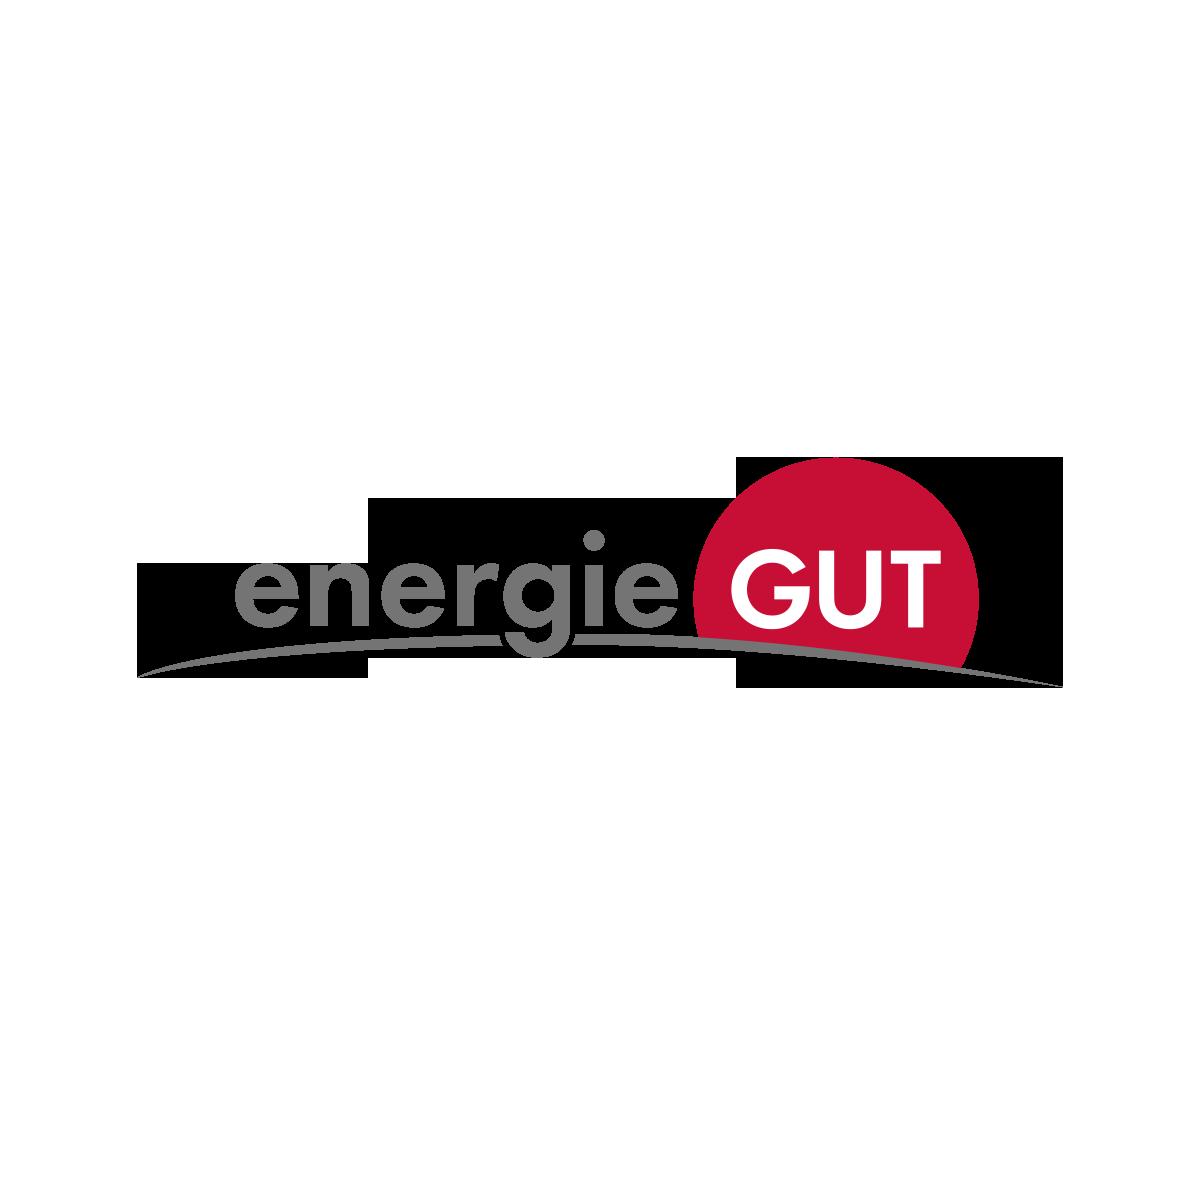 energieGUT GmbH